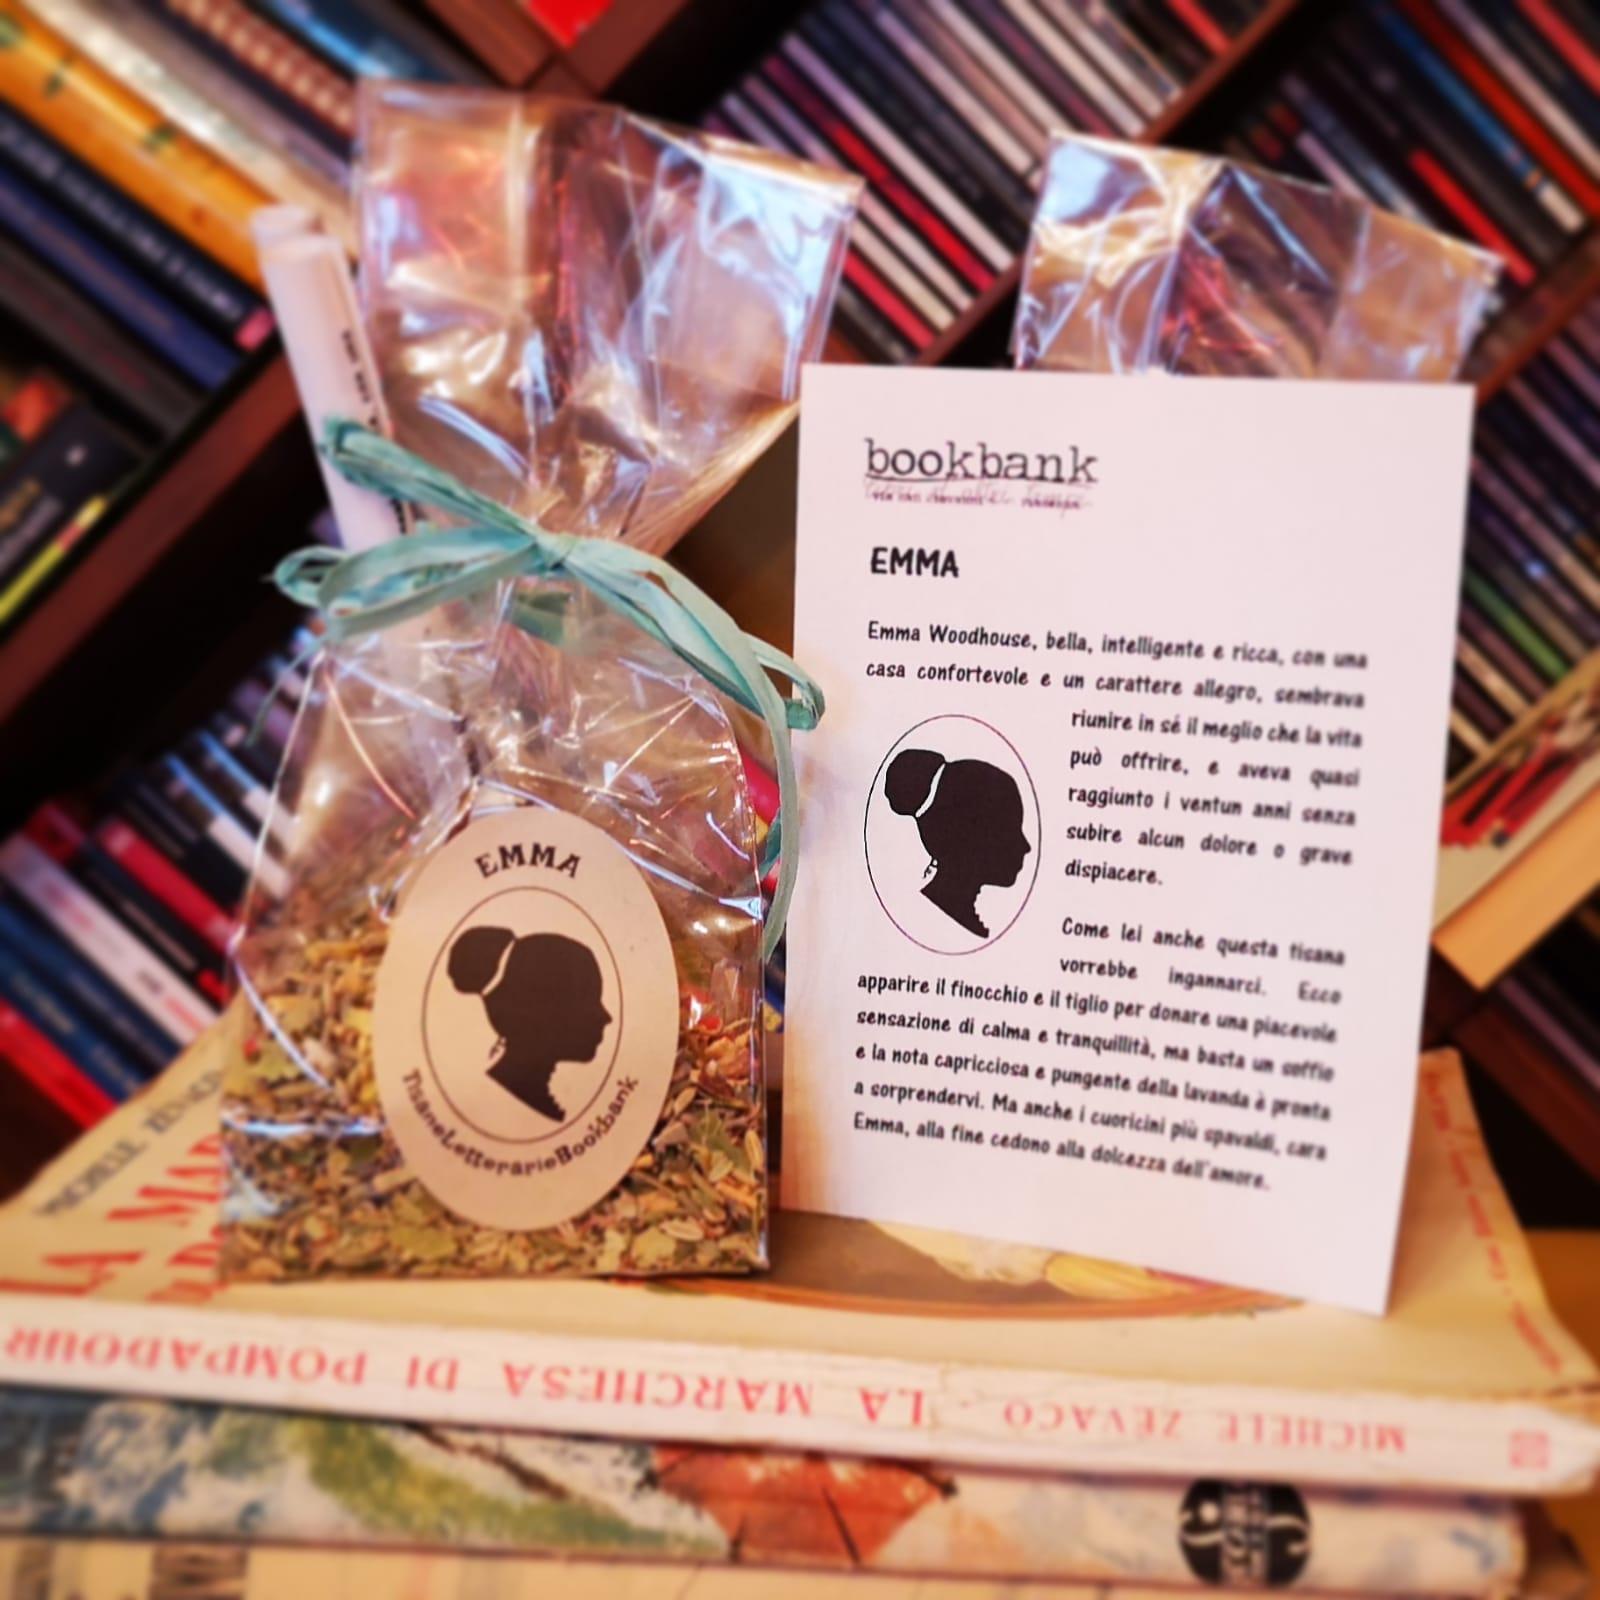 emma tisana letteraria Bookbank